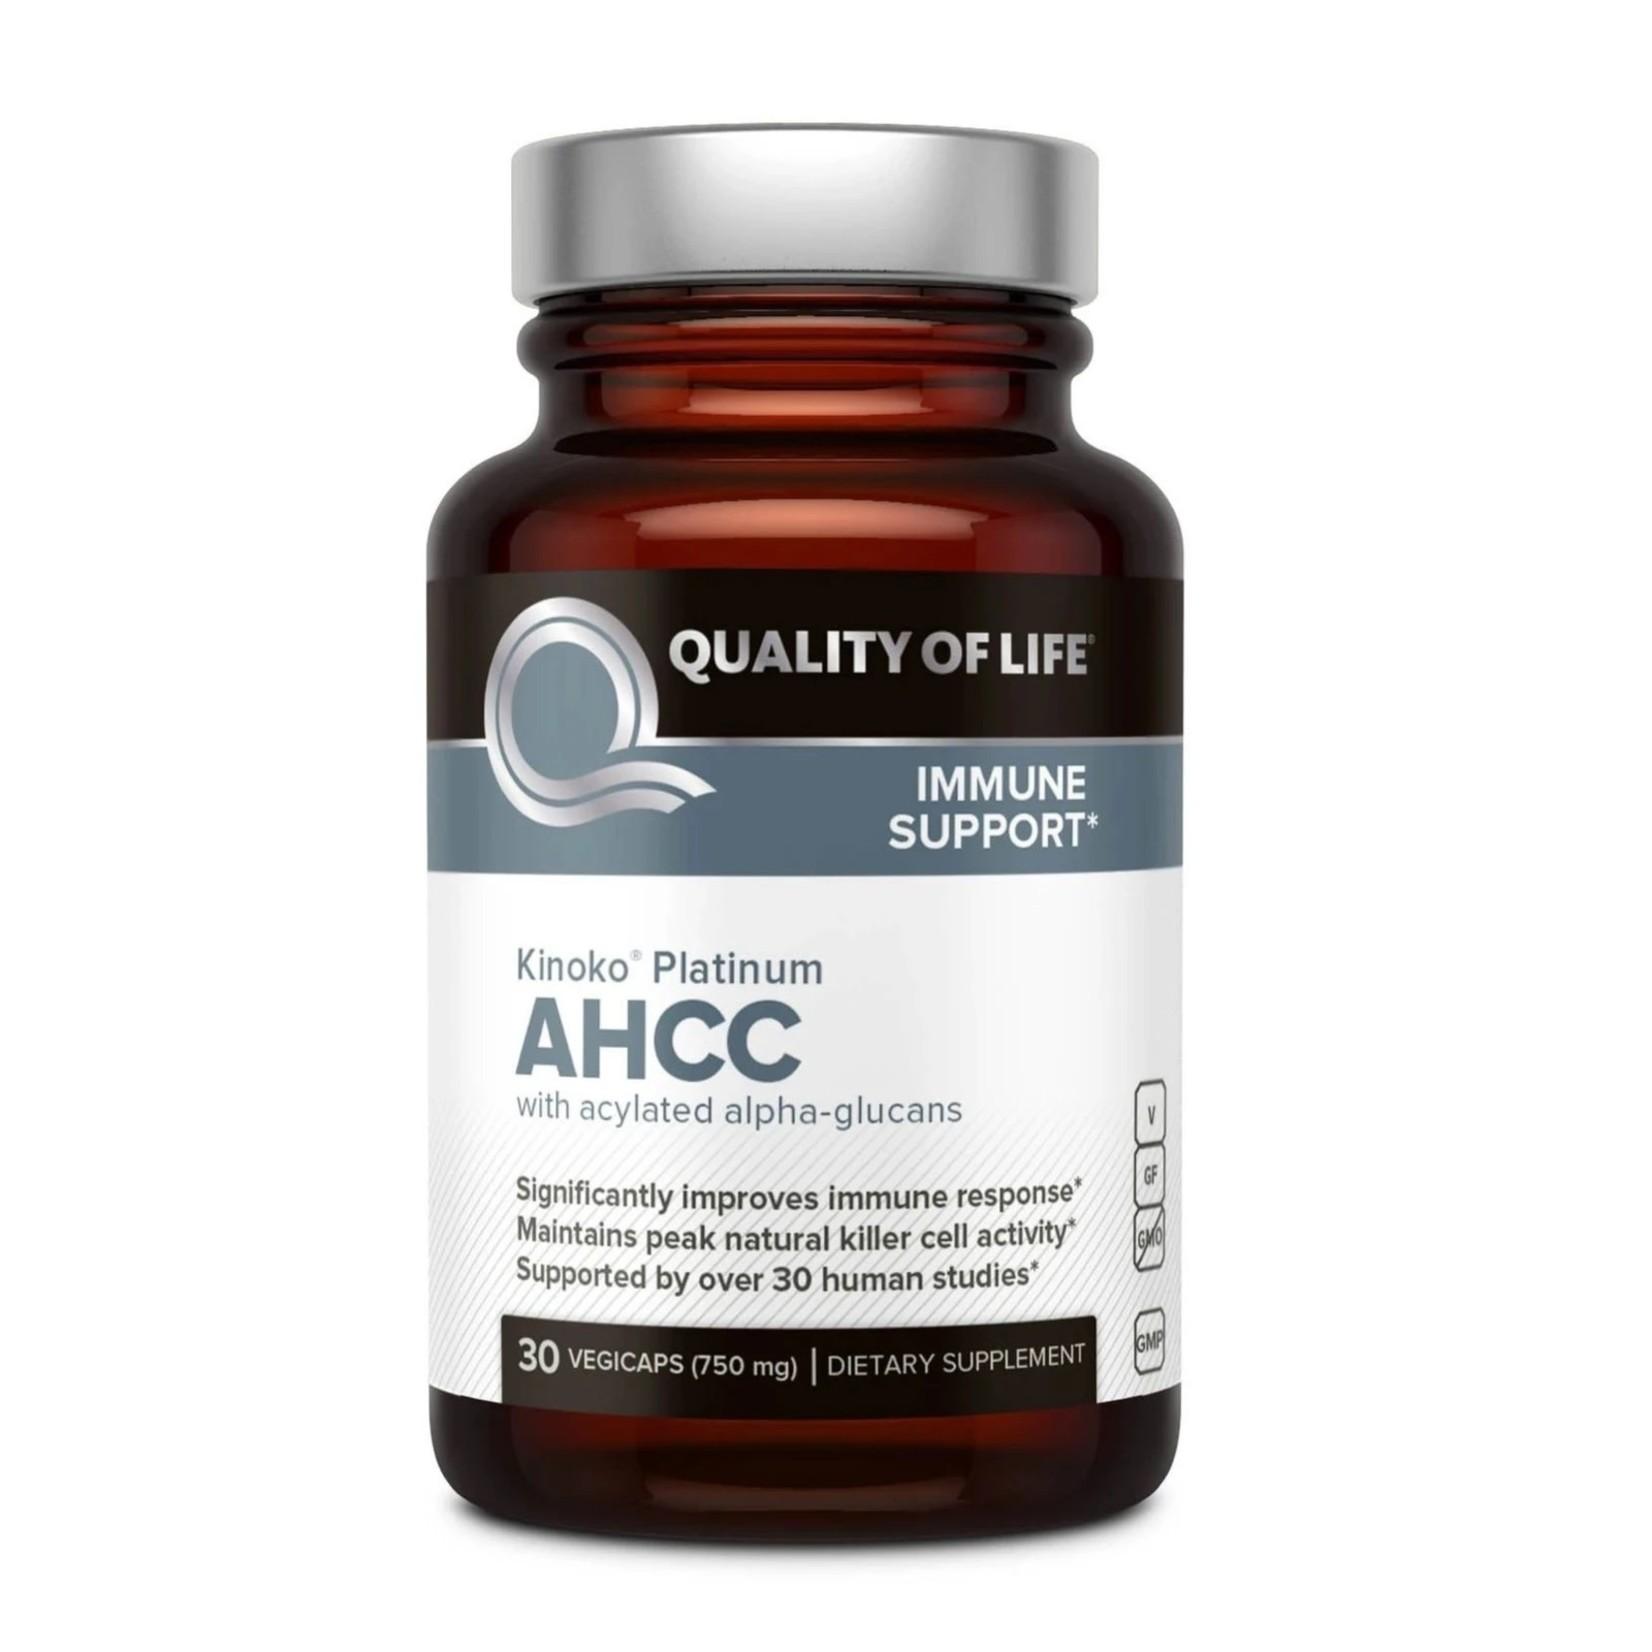 Quality of Life QOL Kinoko Platinum AHCC with acylated alpha-glucans 30ct